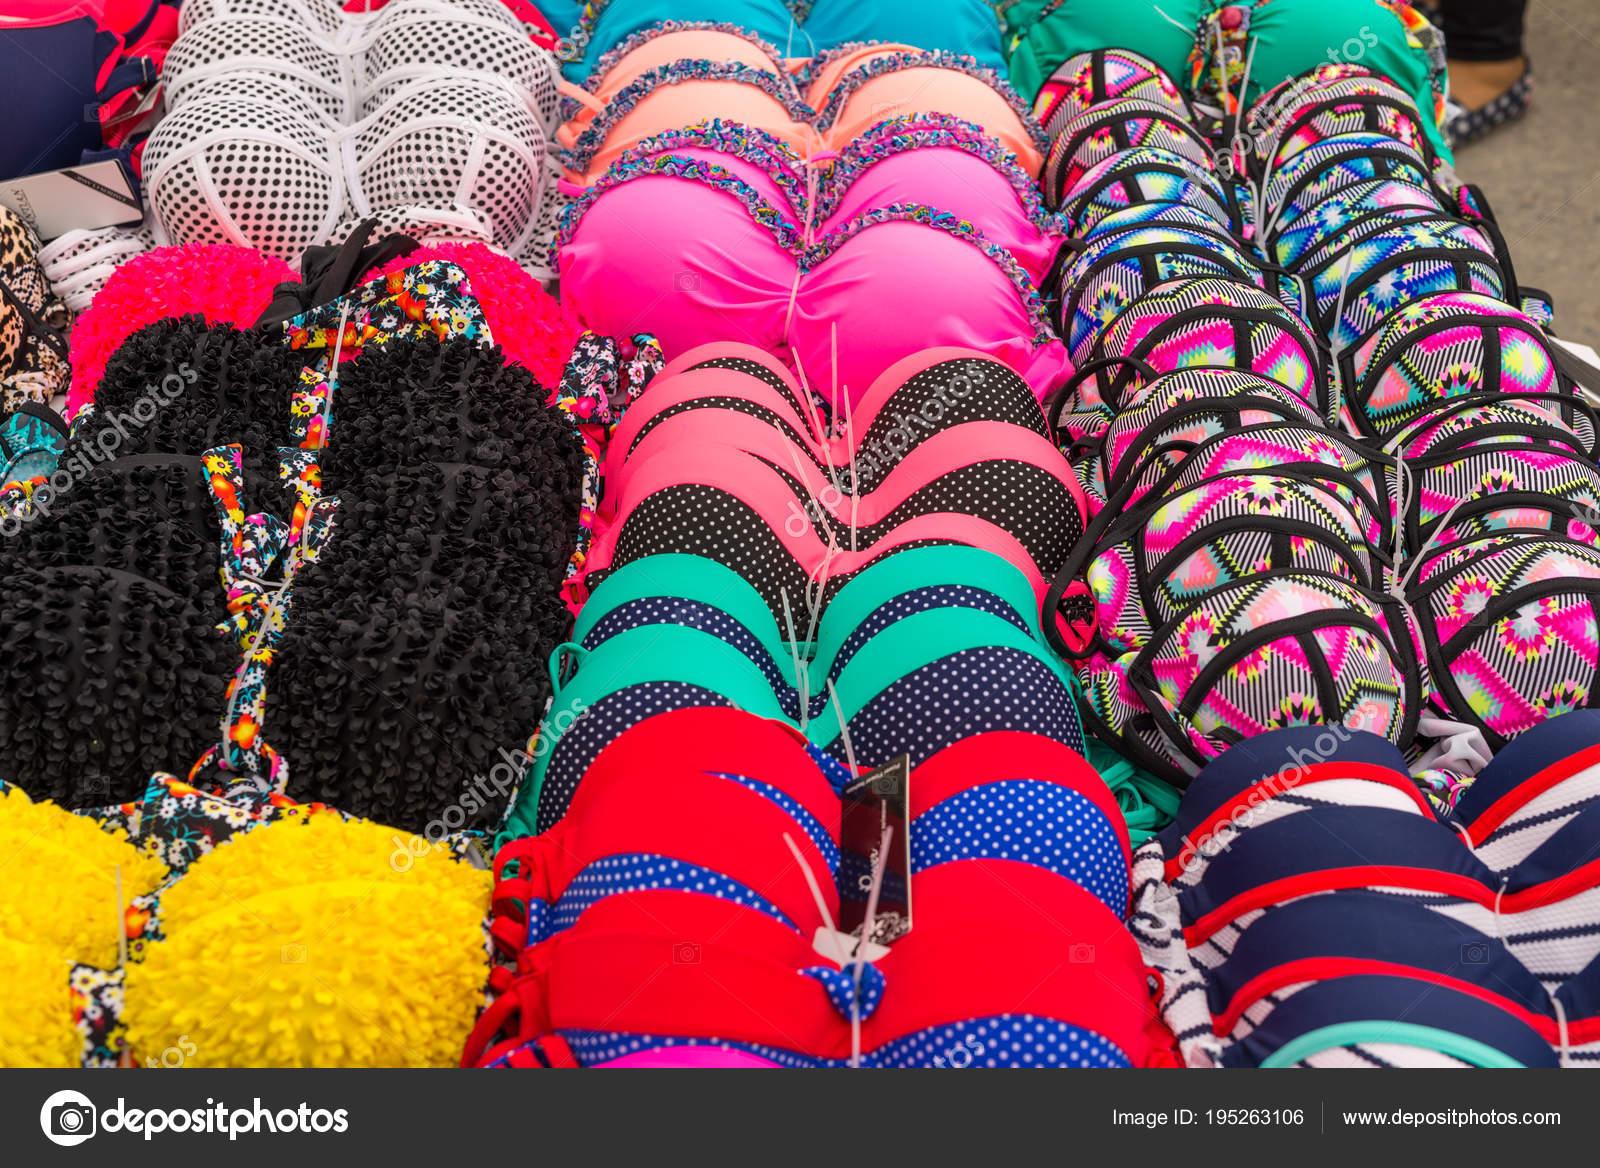 fb754446619 Many Bras Sale Farmers Market Village Tymbaki South Central Crete — Stock  Photo